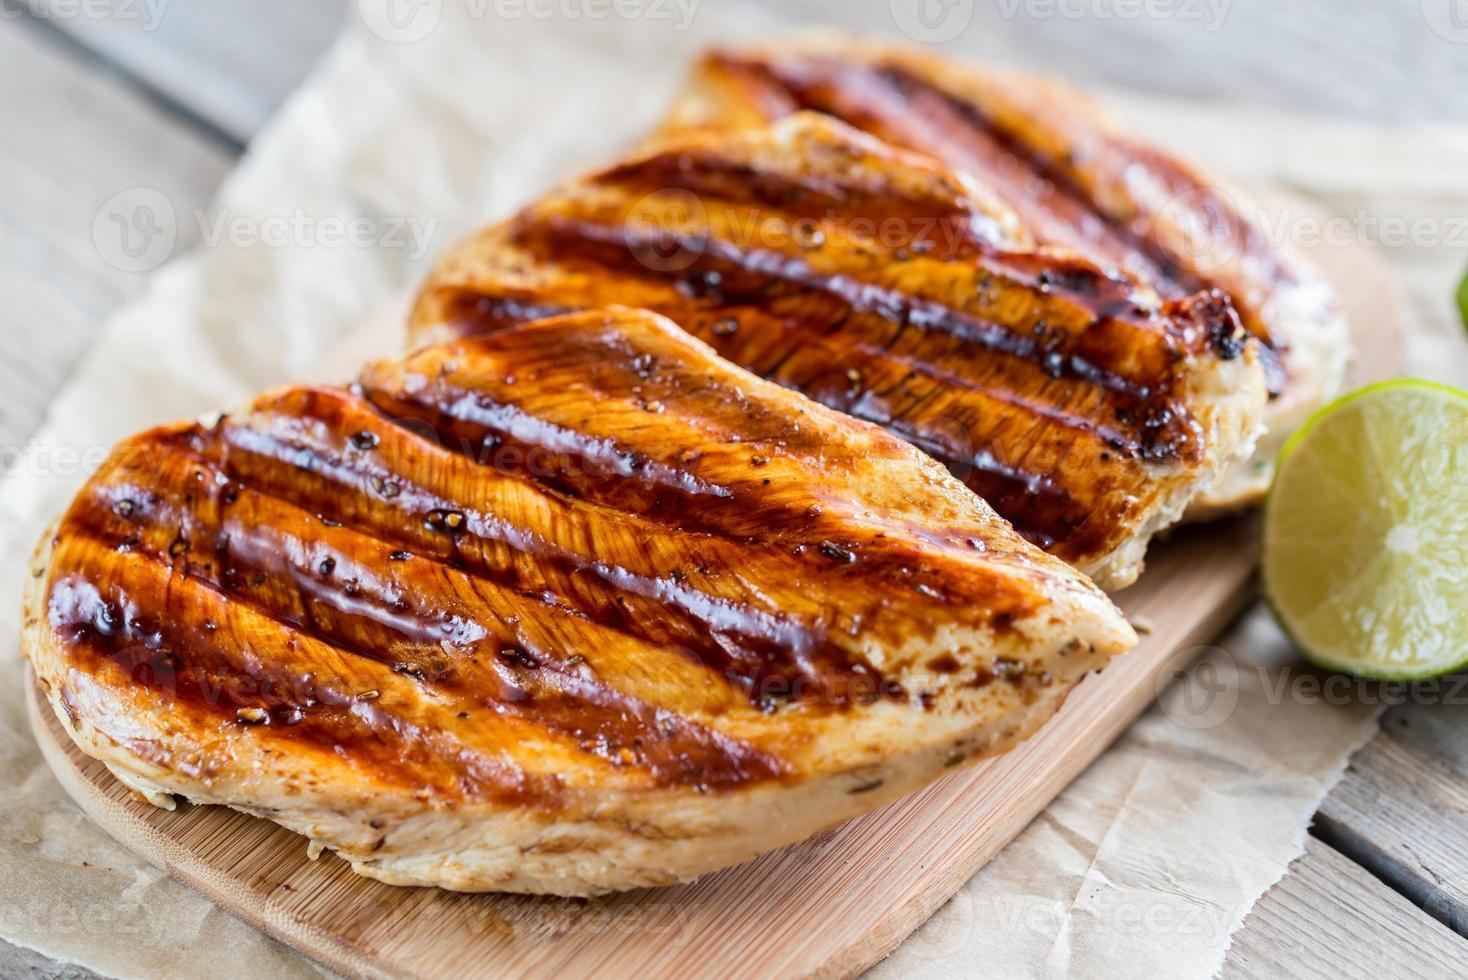 pechugas de pollo a la parrilla en salsa de lima foto